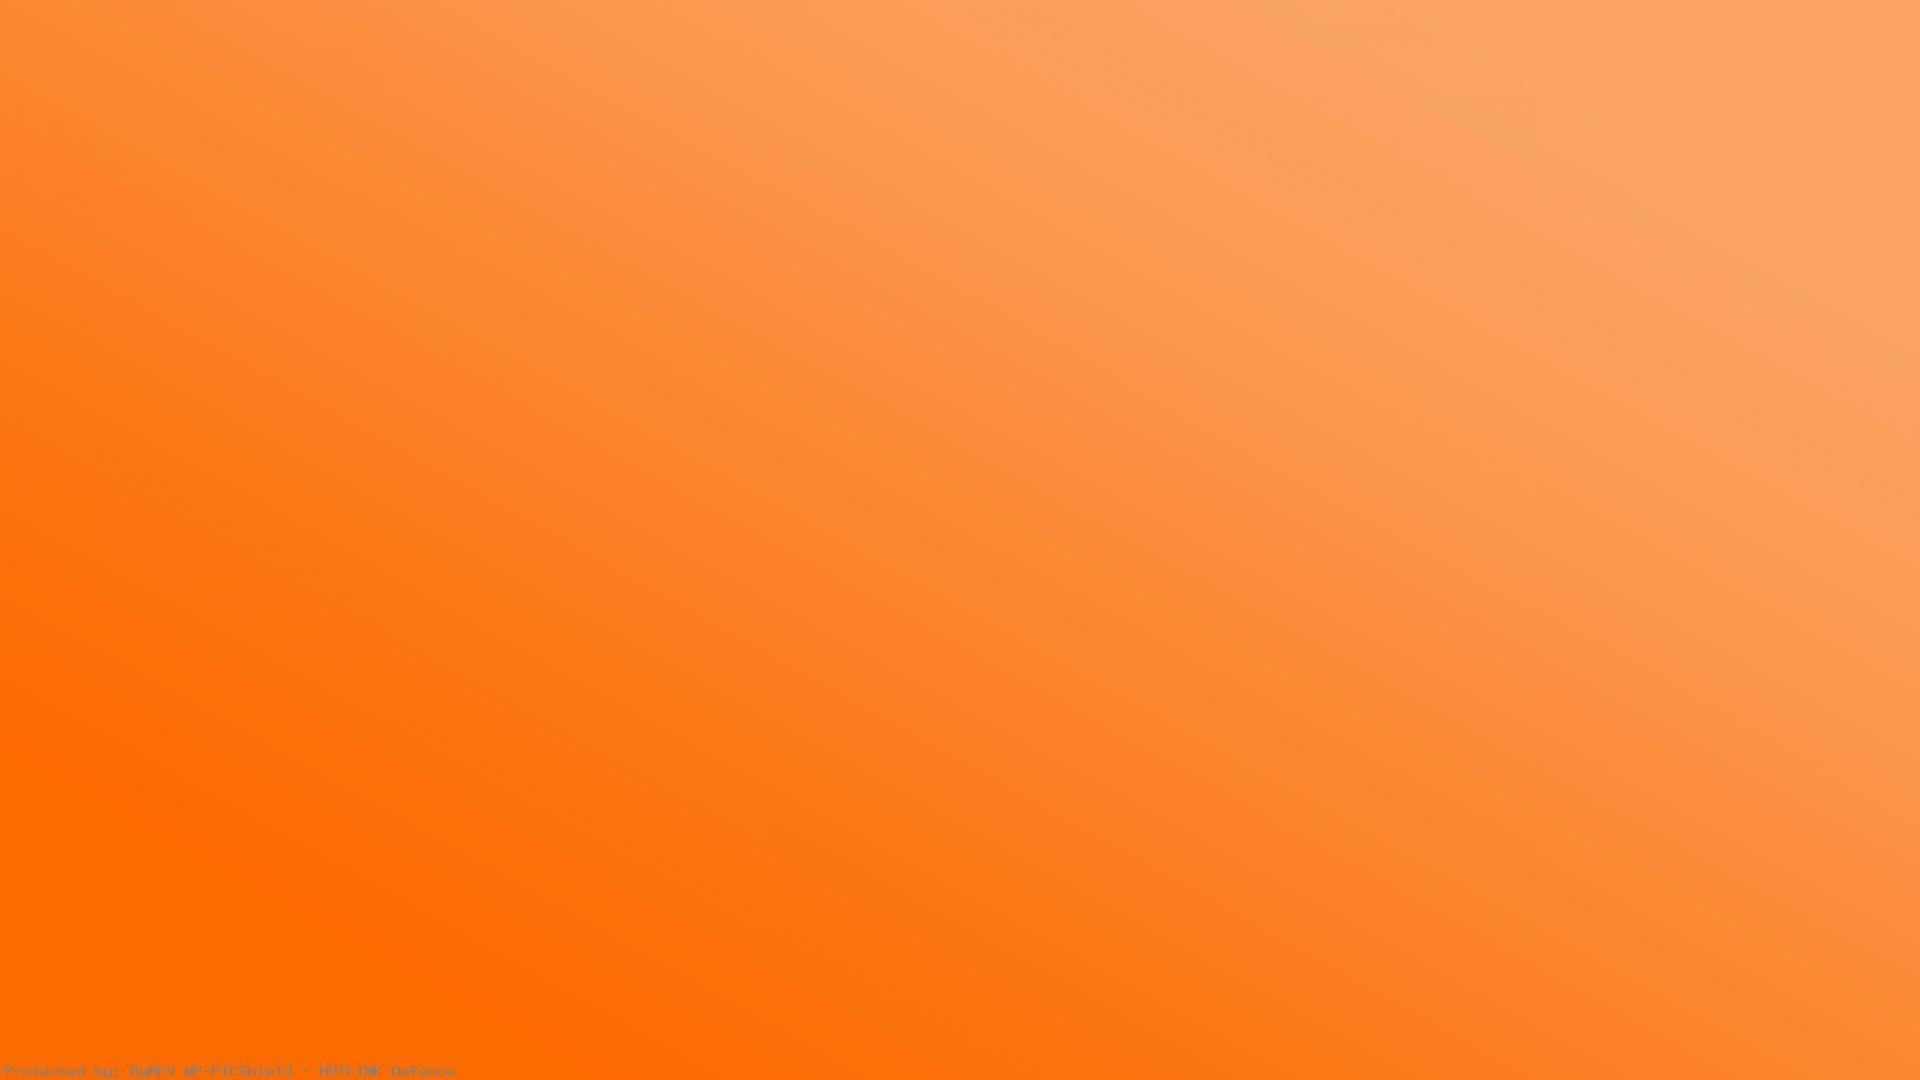 Plain-Neon-Orange-DFILES-%C3%97-Plain-Orange